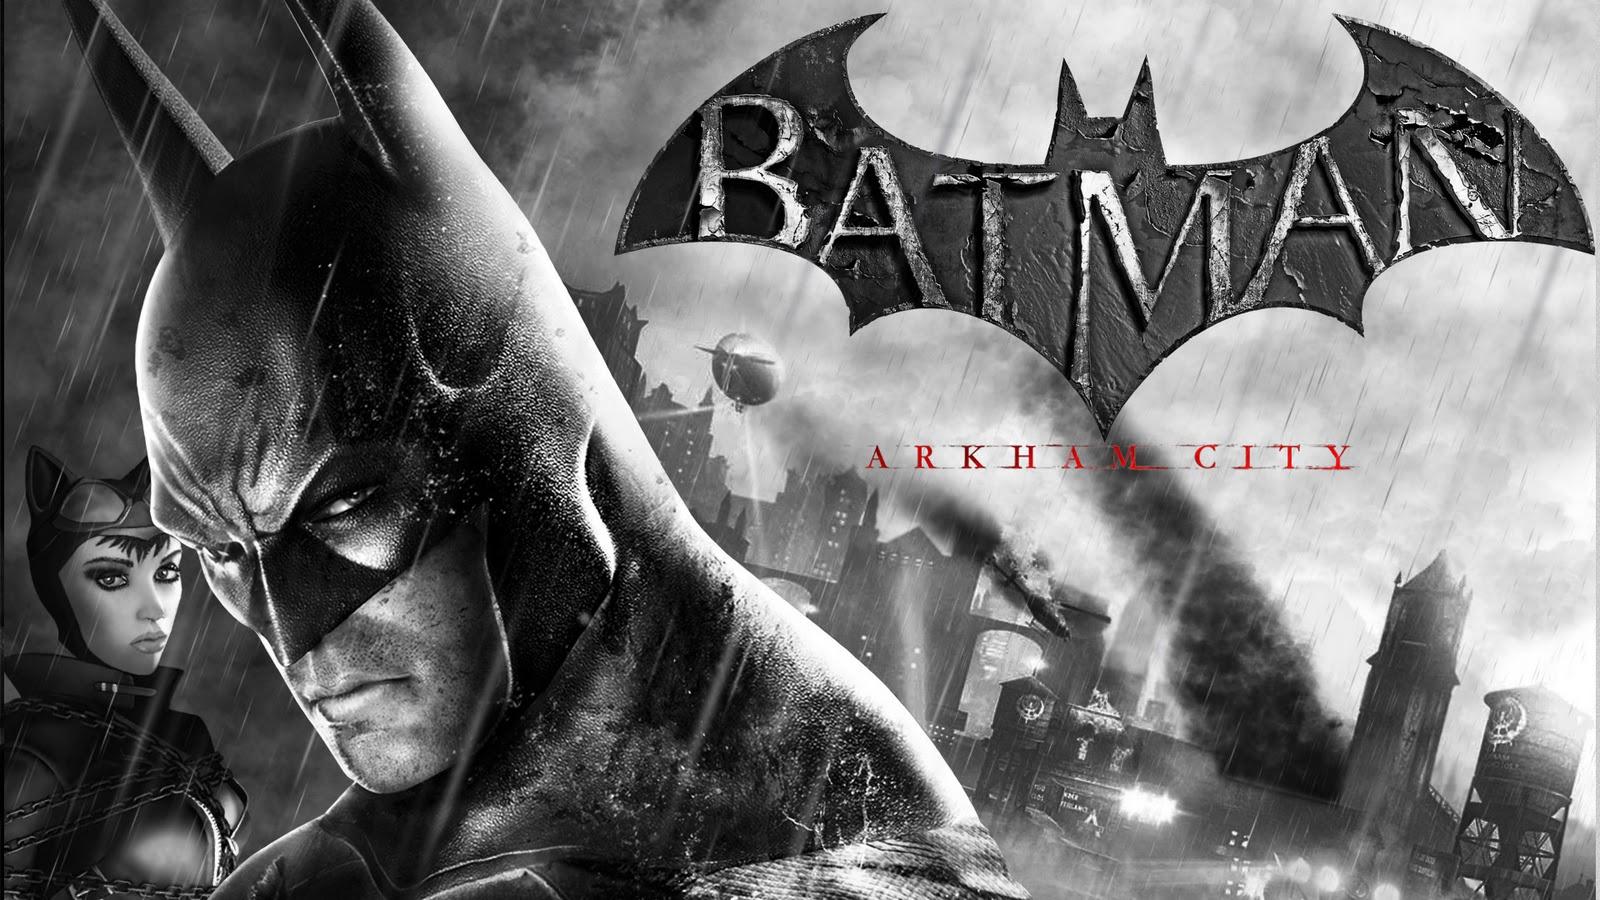 HEROOLOGYcom batman arkham city wallpaper hd 1080p 1600x900